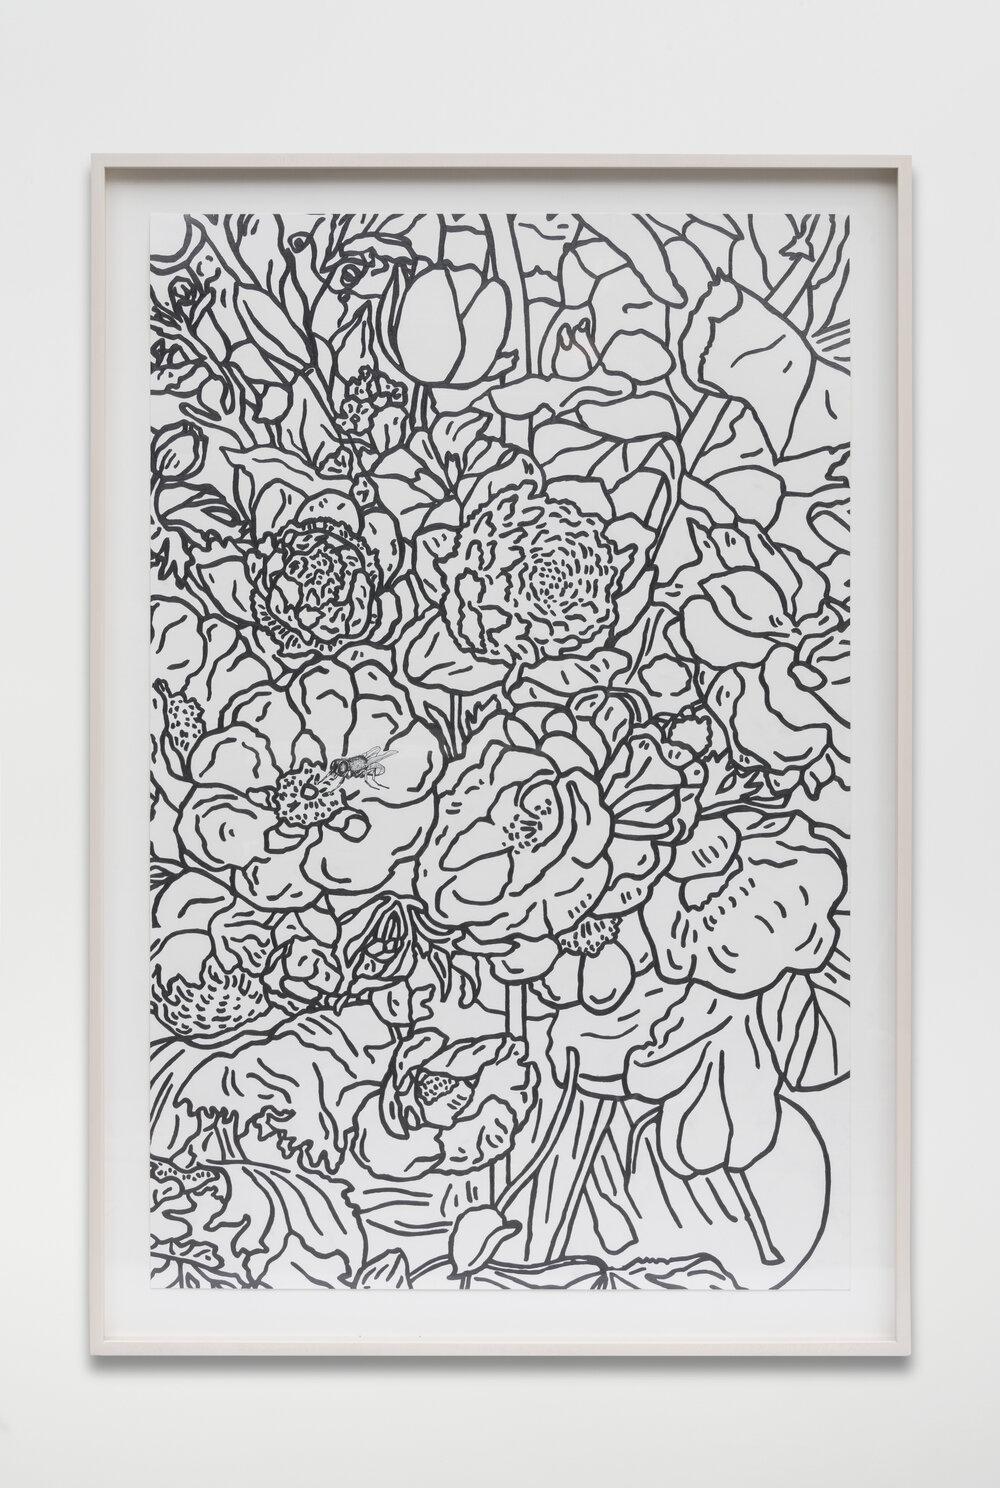 Bouquet (For Odilon), 2017 graphite on paper 120,7 x 82,5 x 5 cm - 47 1/2 x 32 1/2 x 2 inches